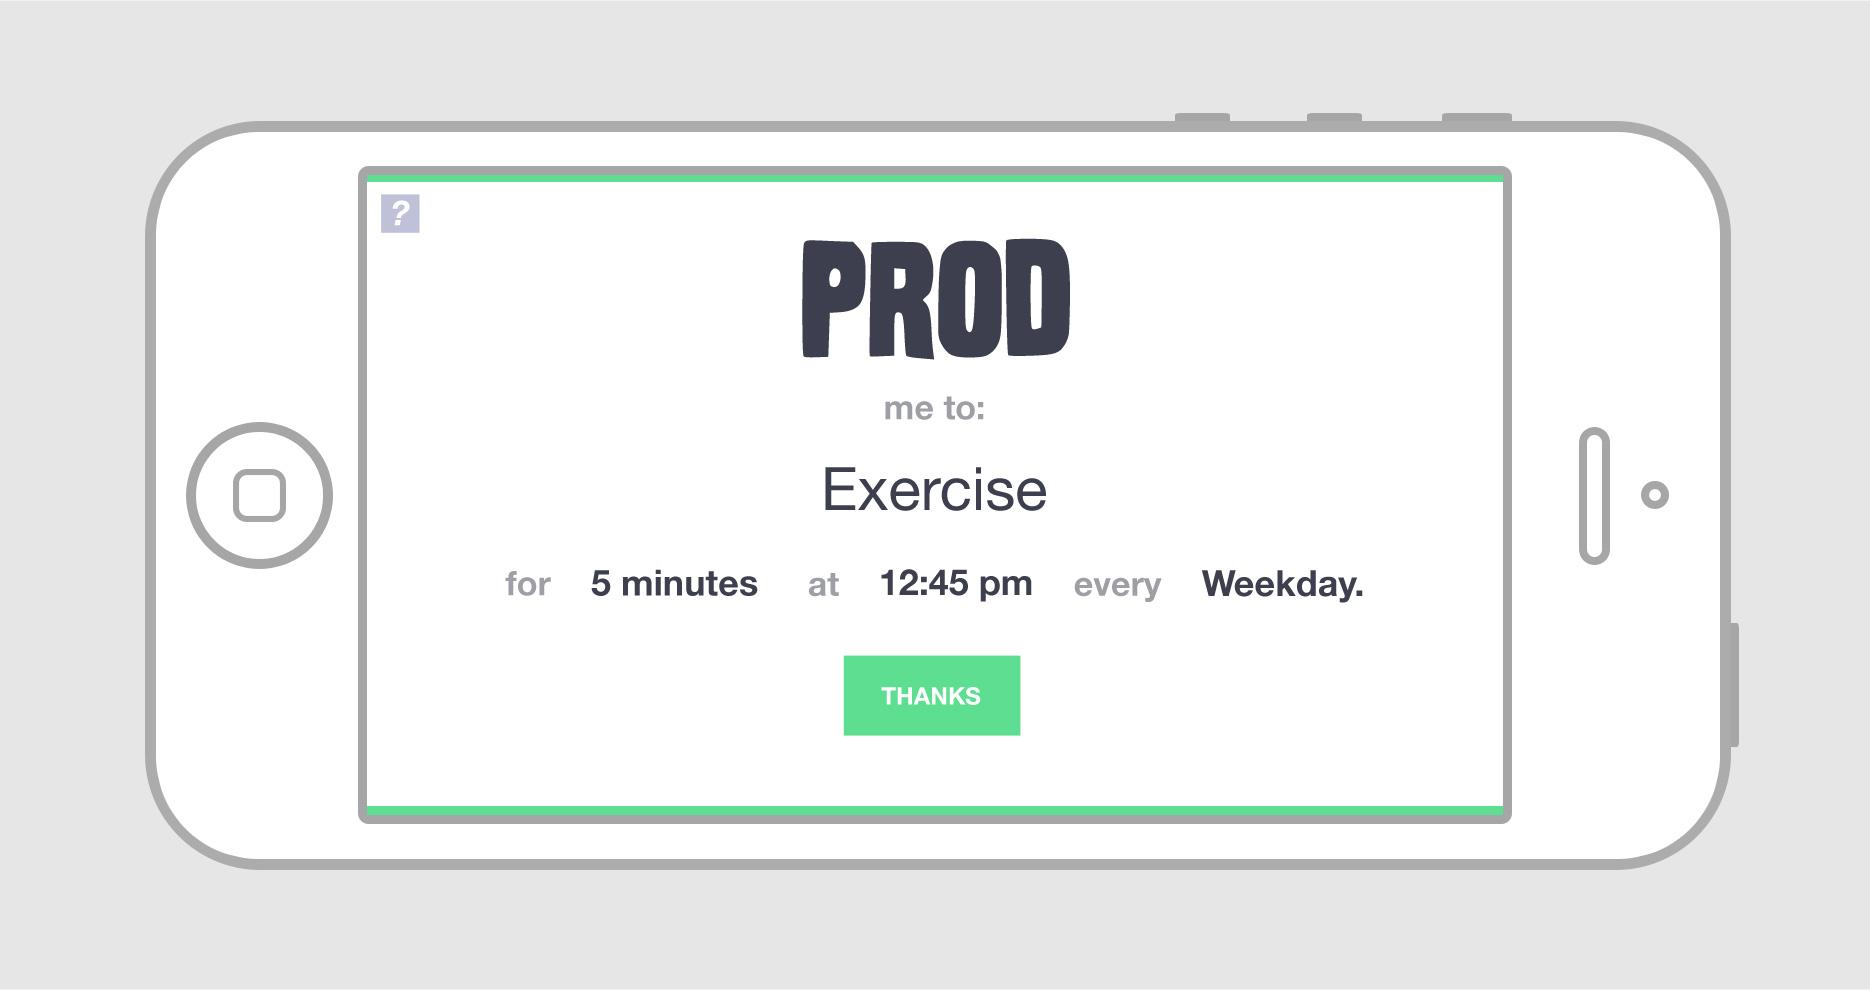 Prod - image 2 - student project